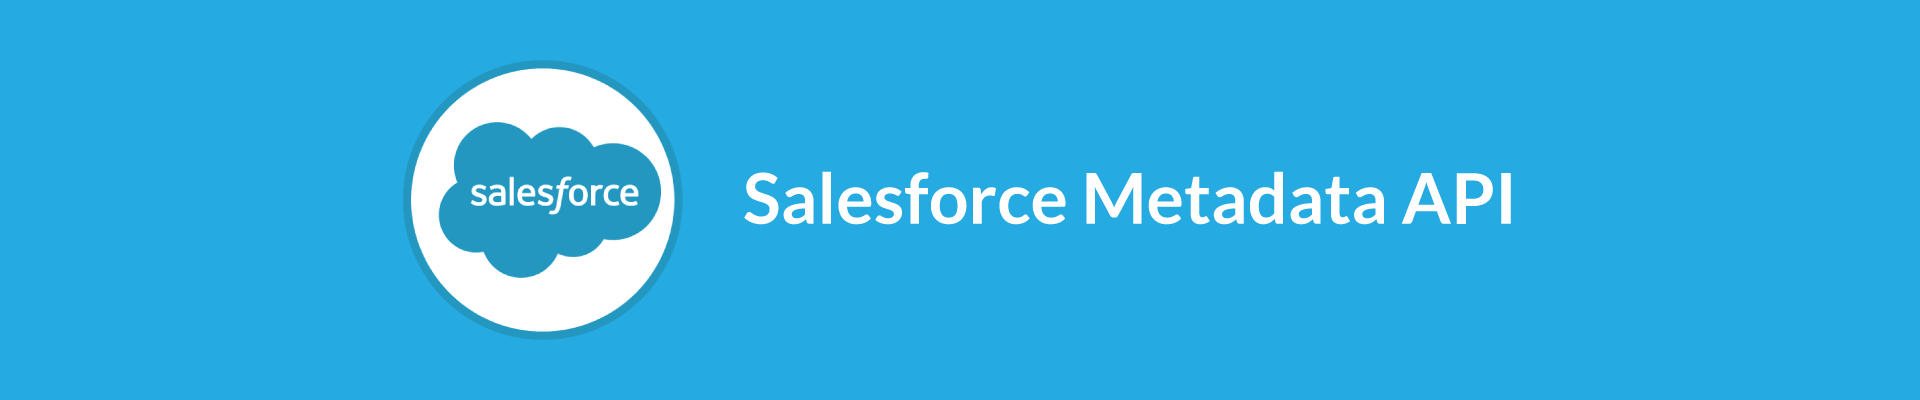 Salesforce Metadata API